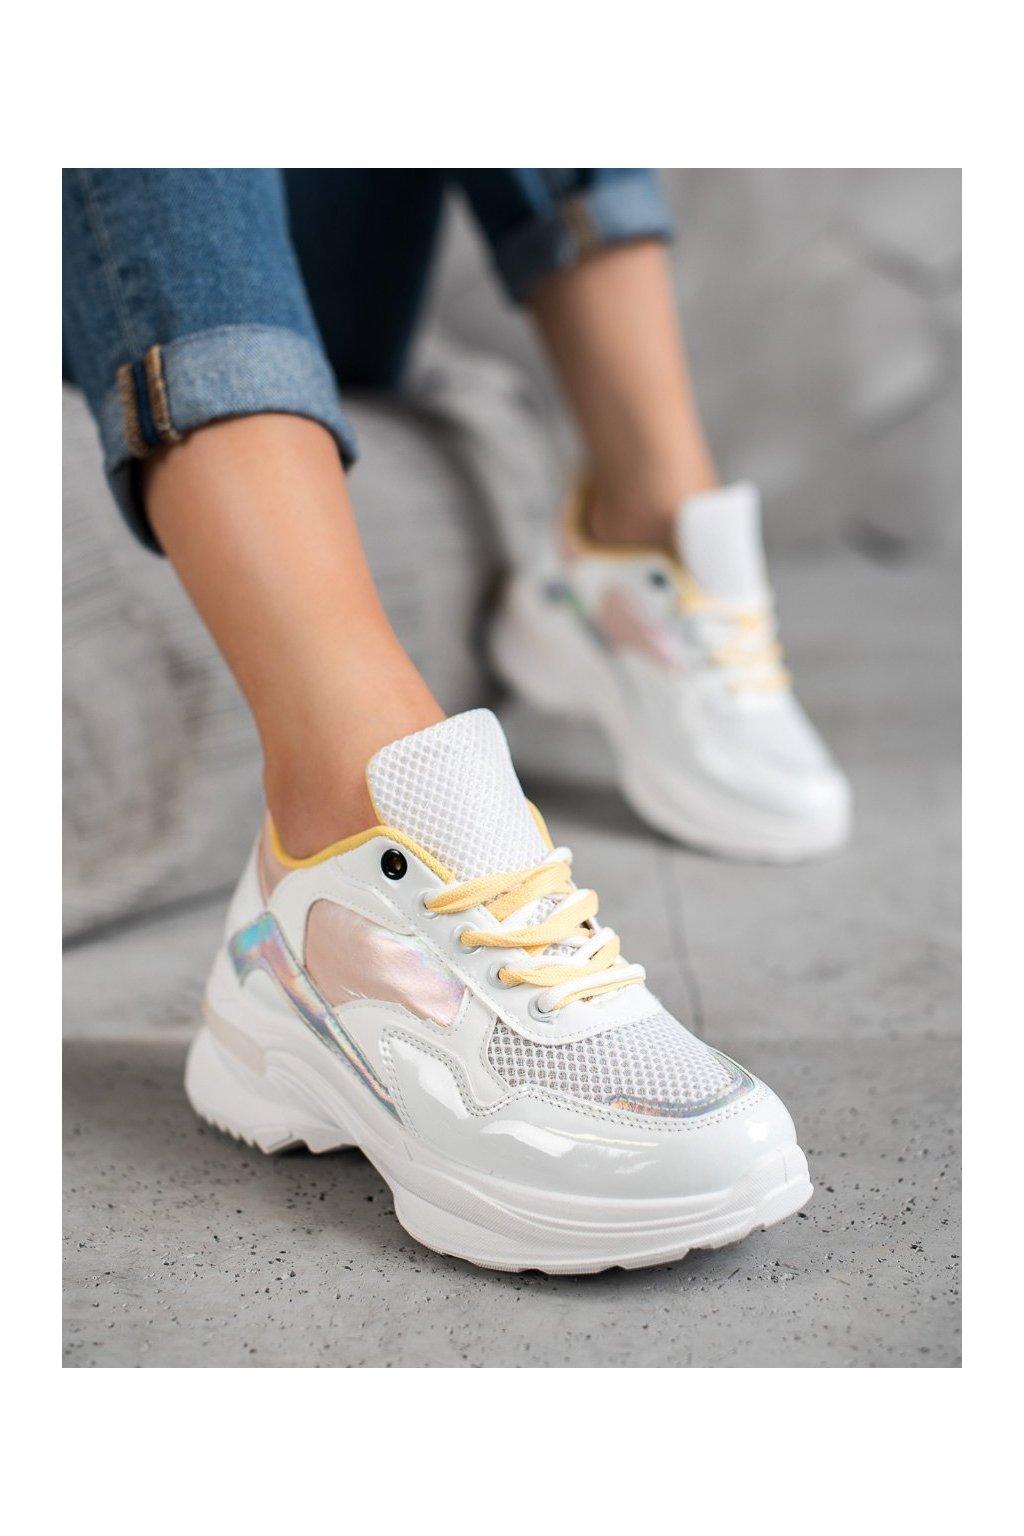 Biele dámske tenisky Shelovet kod BO-537W/Y